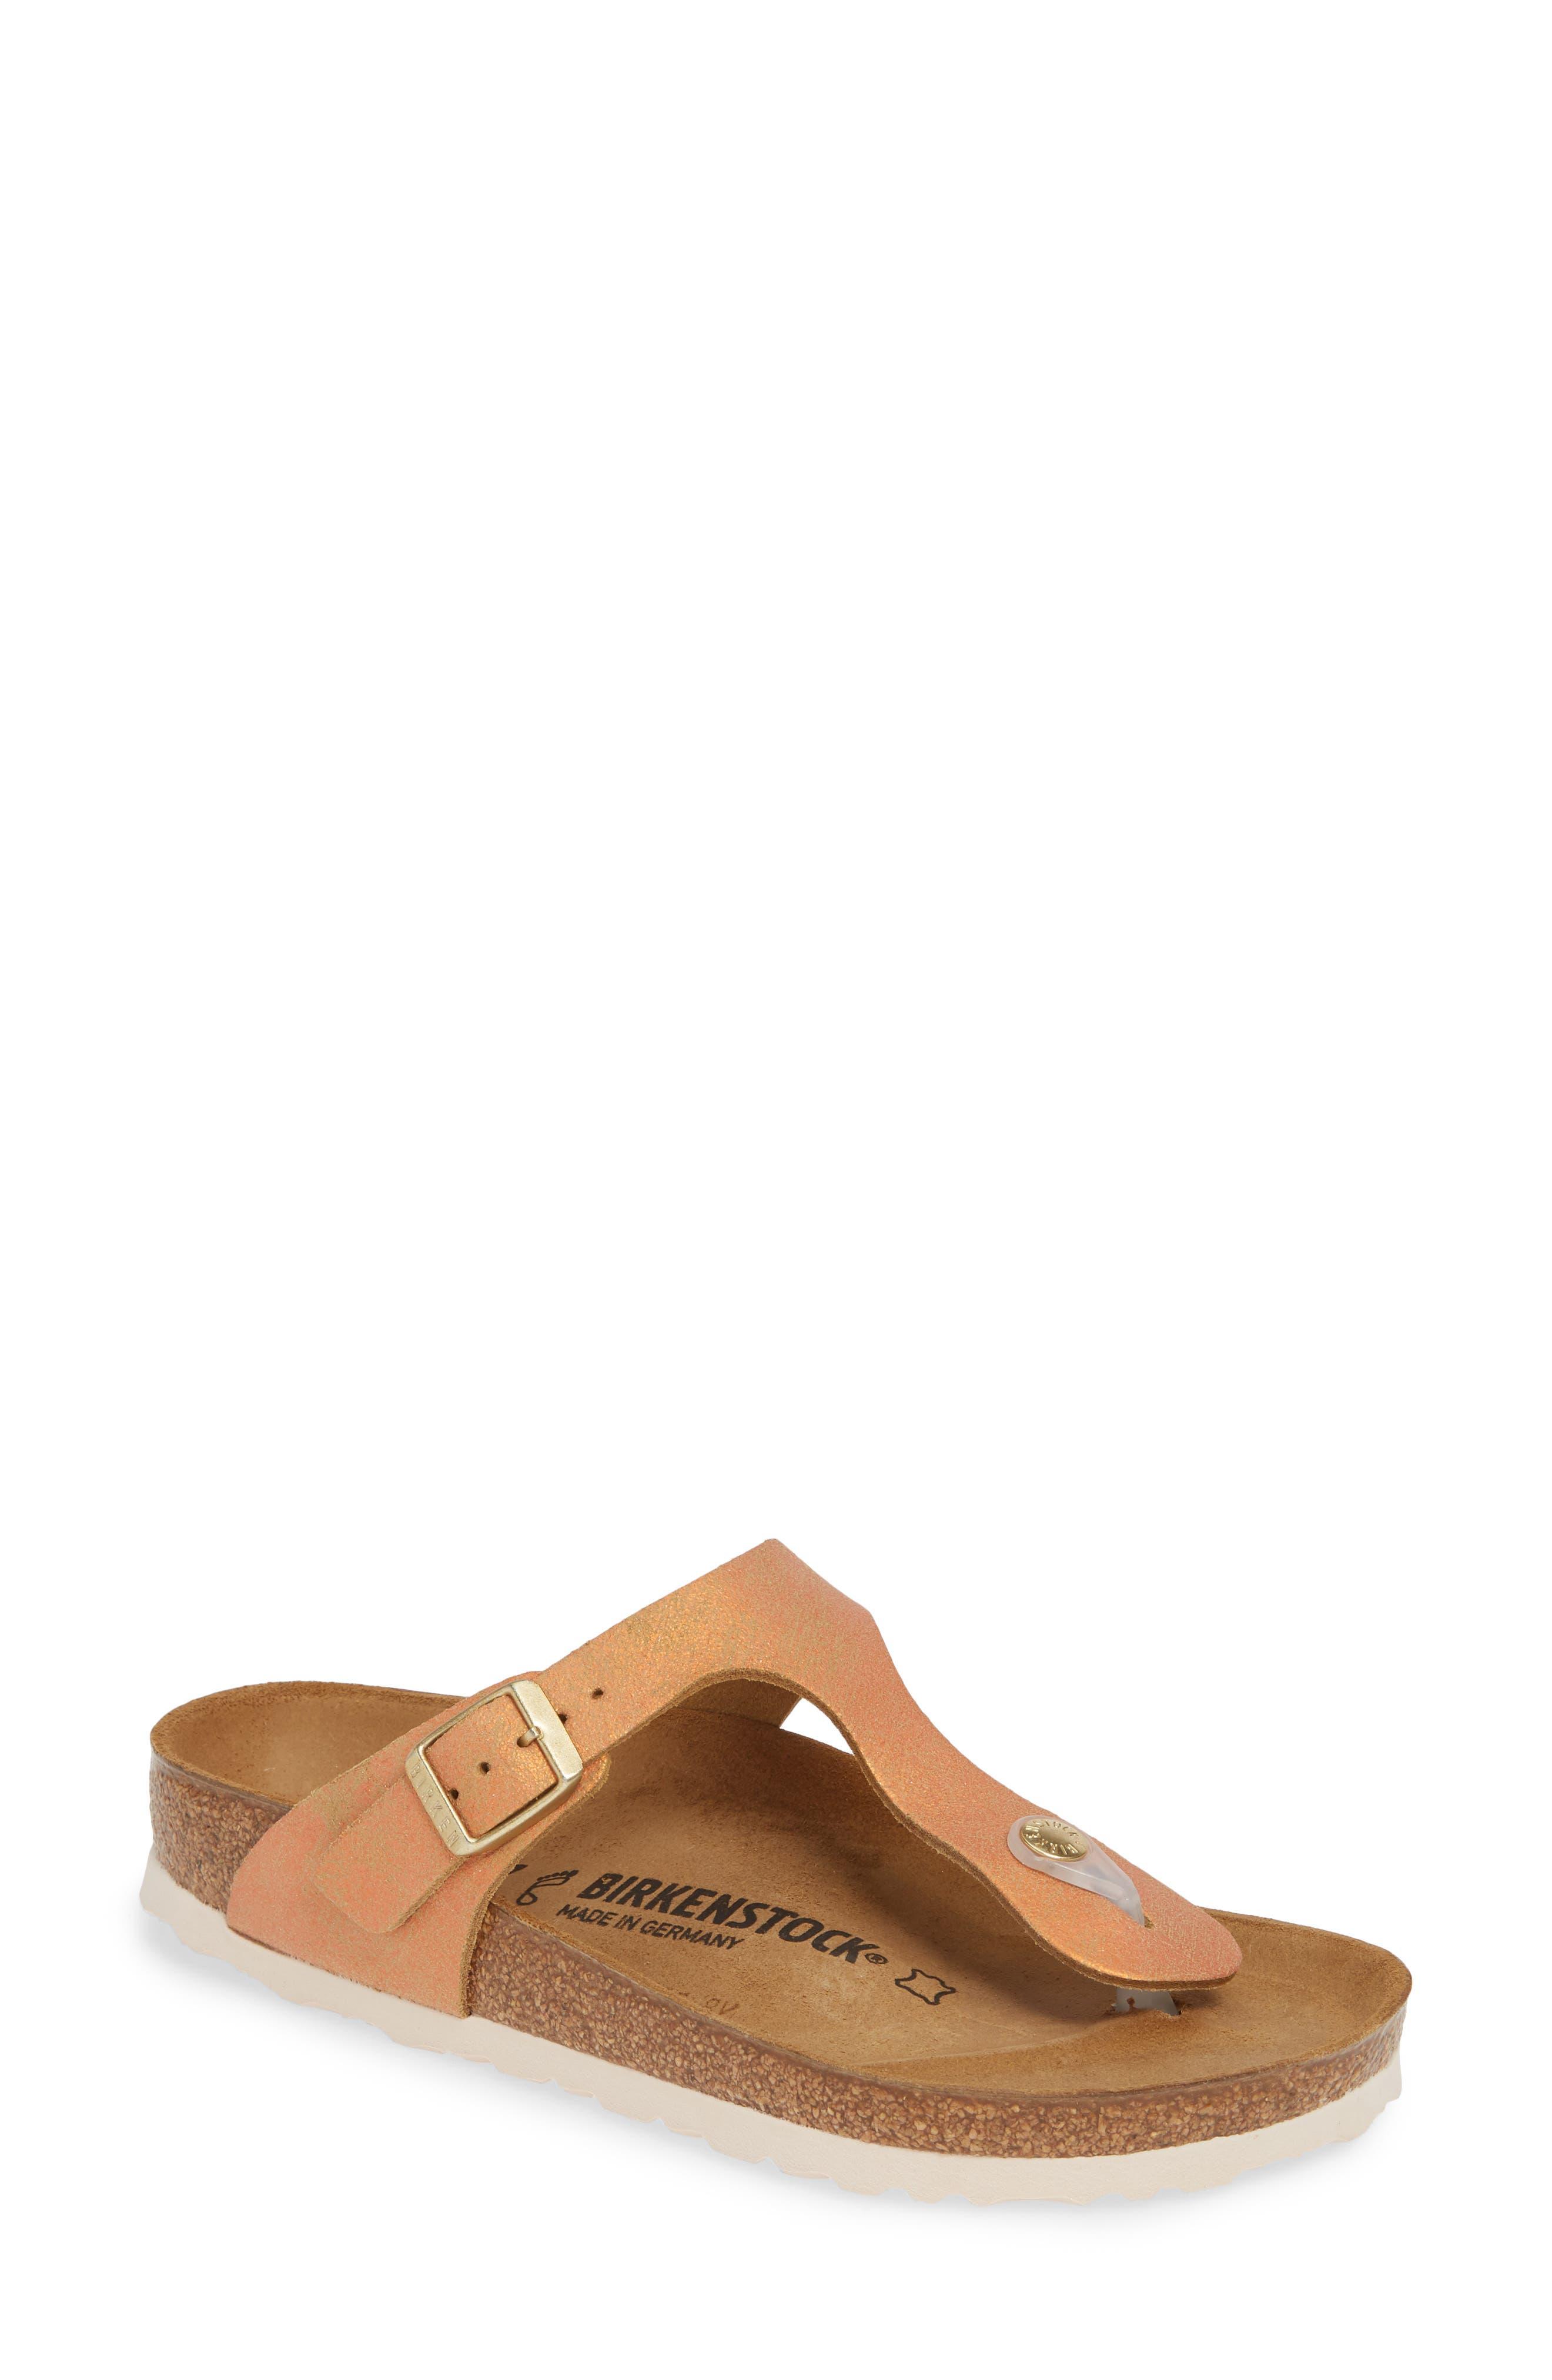 Birkenstock Gizeh Flip Flop,8.5 - Pink